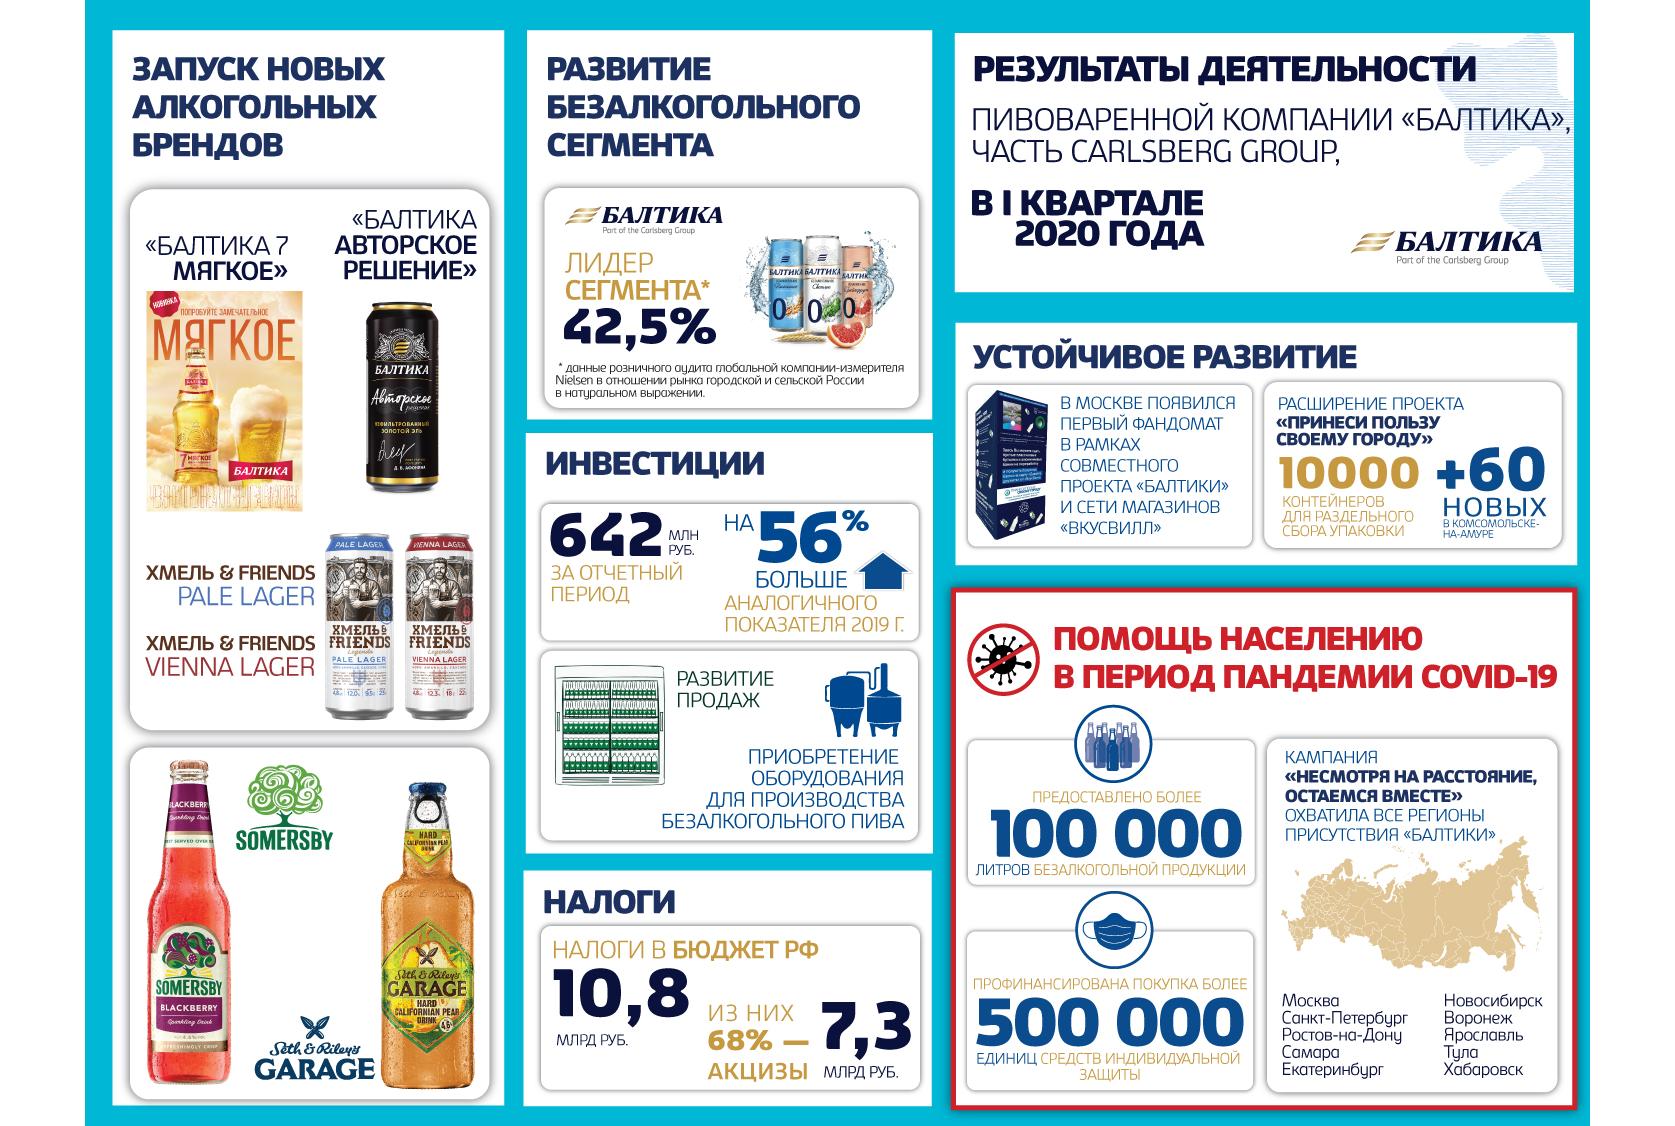 infografika-2020-i-kvartal-3_03